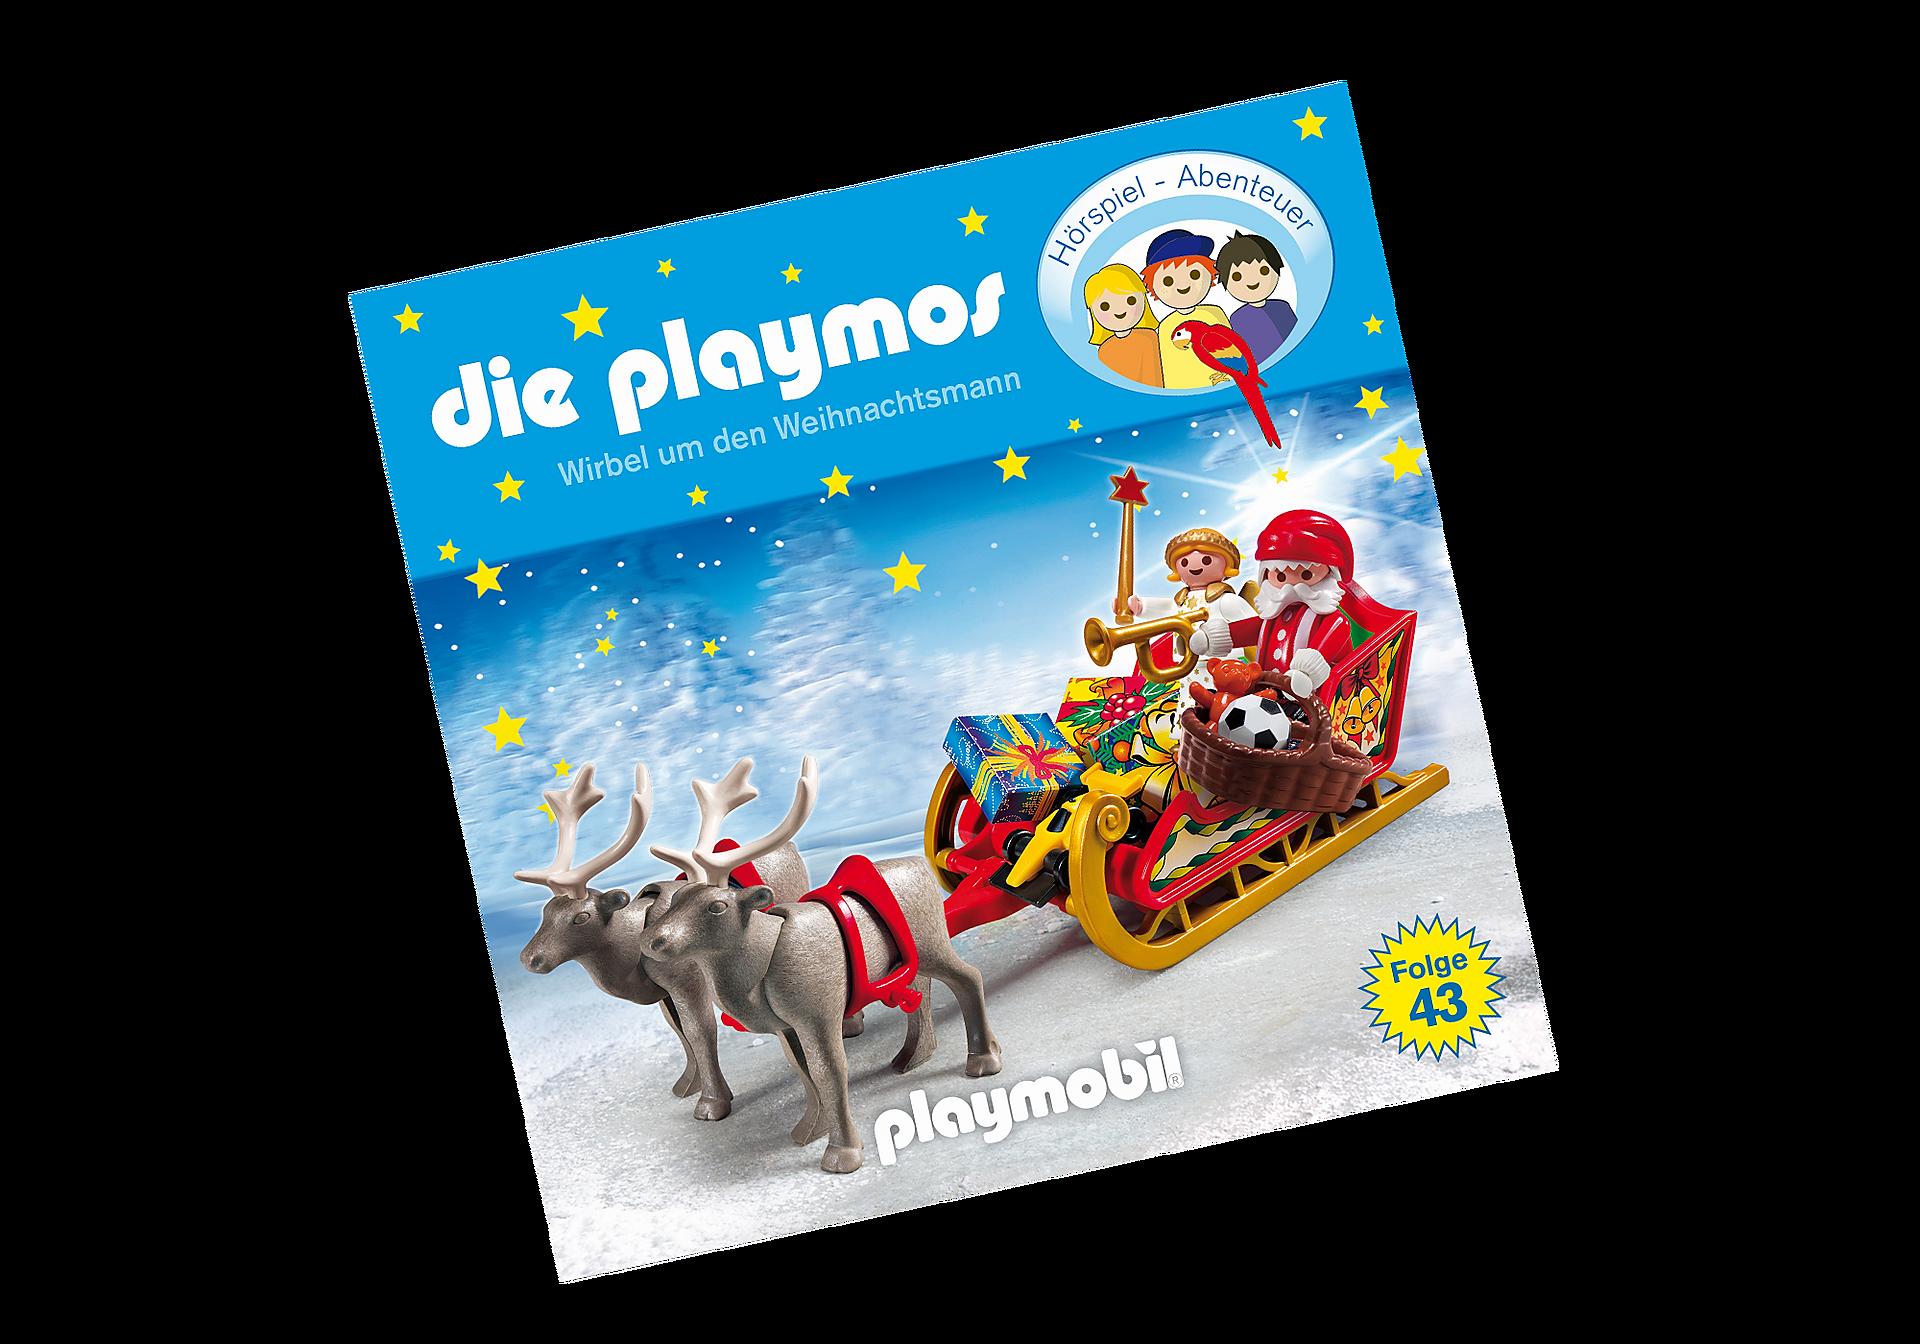 http://media.playmobil.com/i/playmobil/80456_product_detail/Wirbel um den Weihnachtsmann (43) - CD